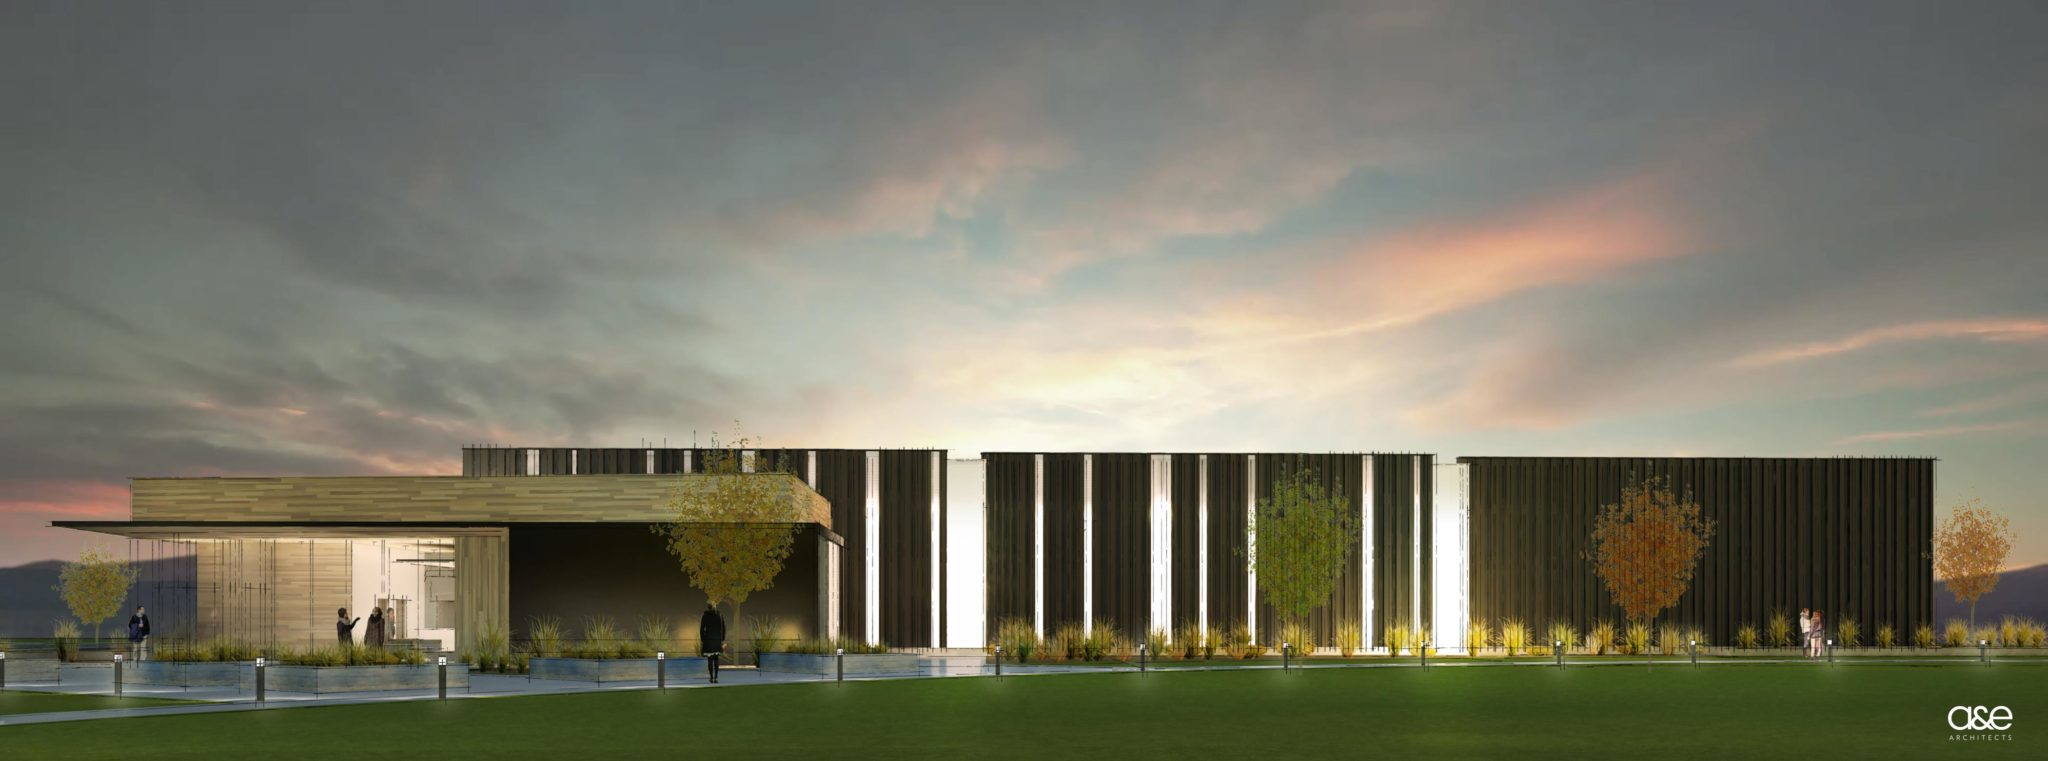 MSU Innovation Campus, Bozeman MT